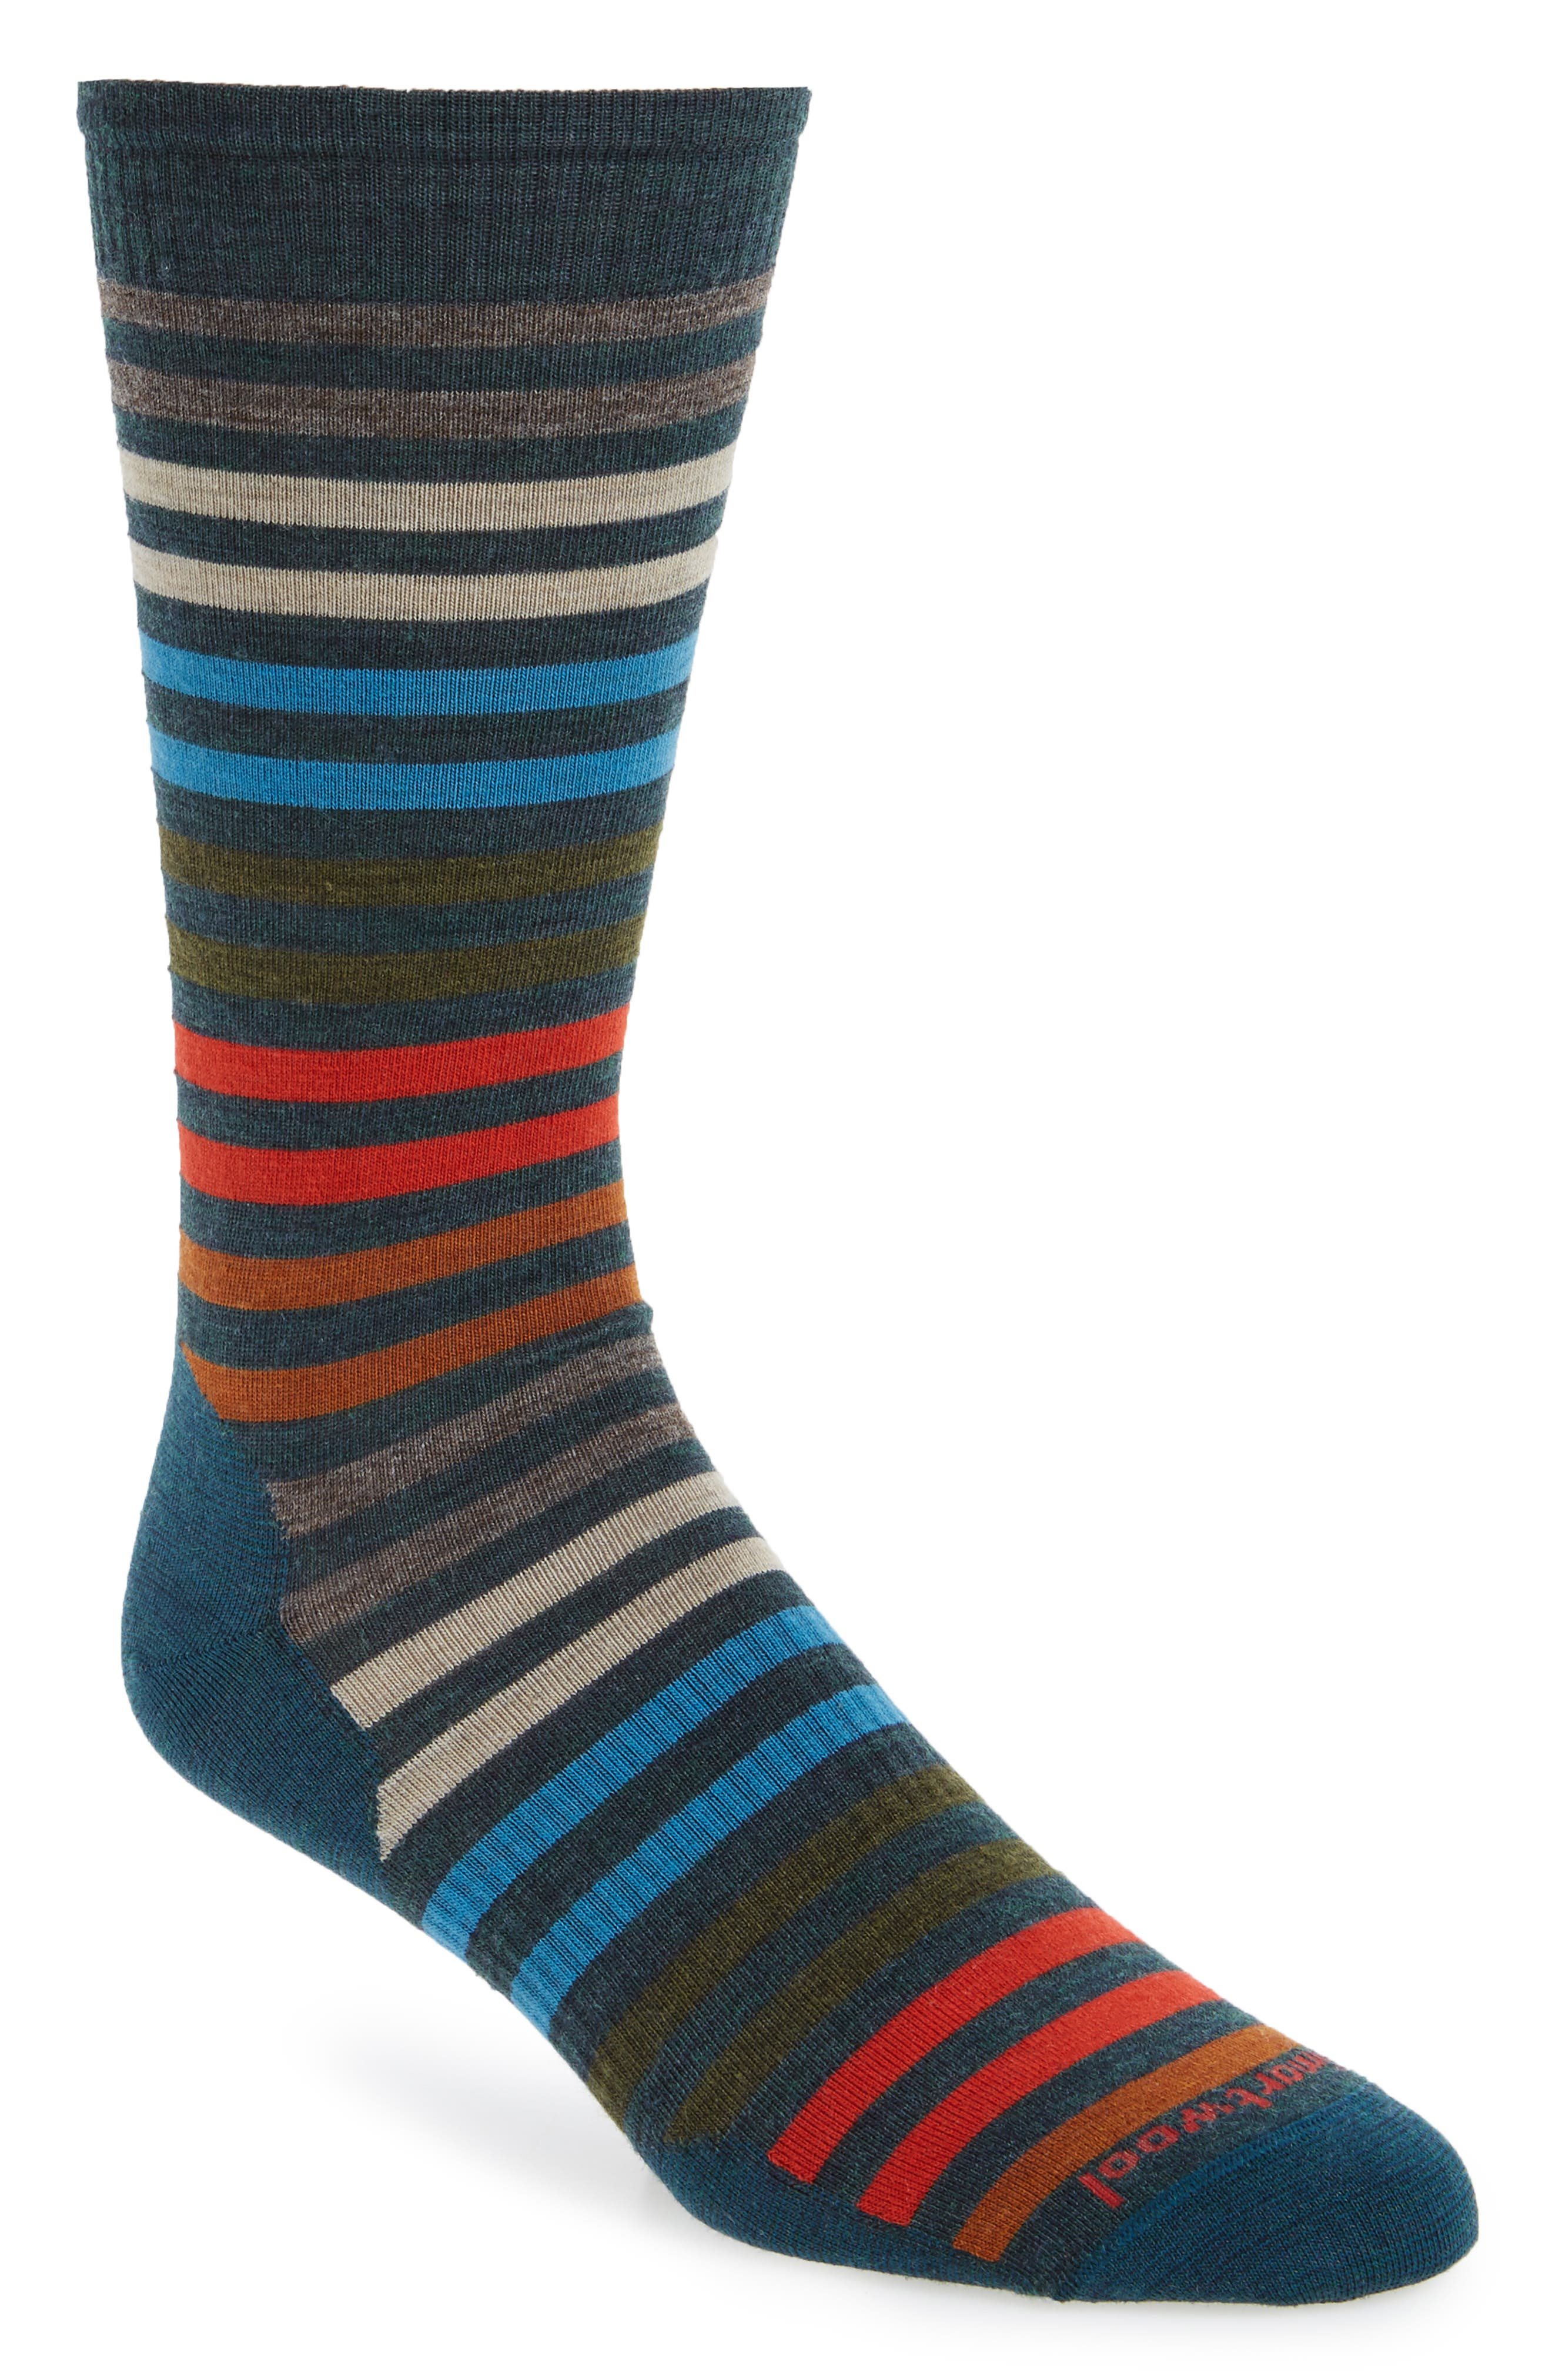 'Spruce Street' Stripe Merino Wool Blend Socks,                         Main,                         color, Lochness Heather